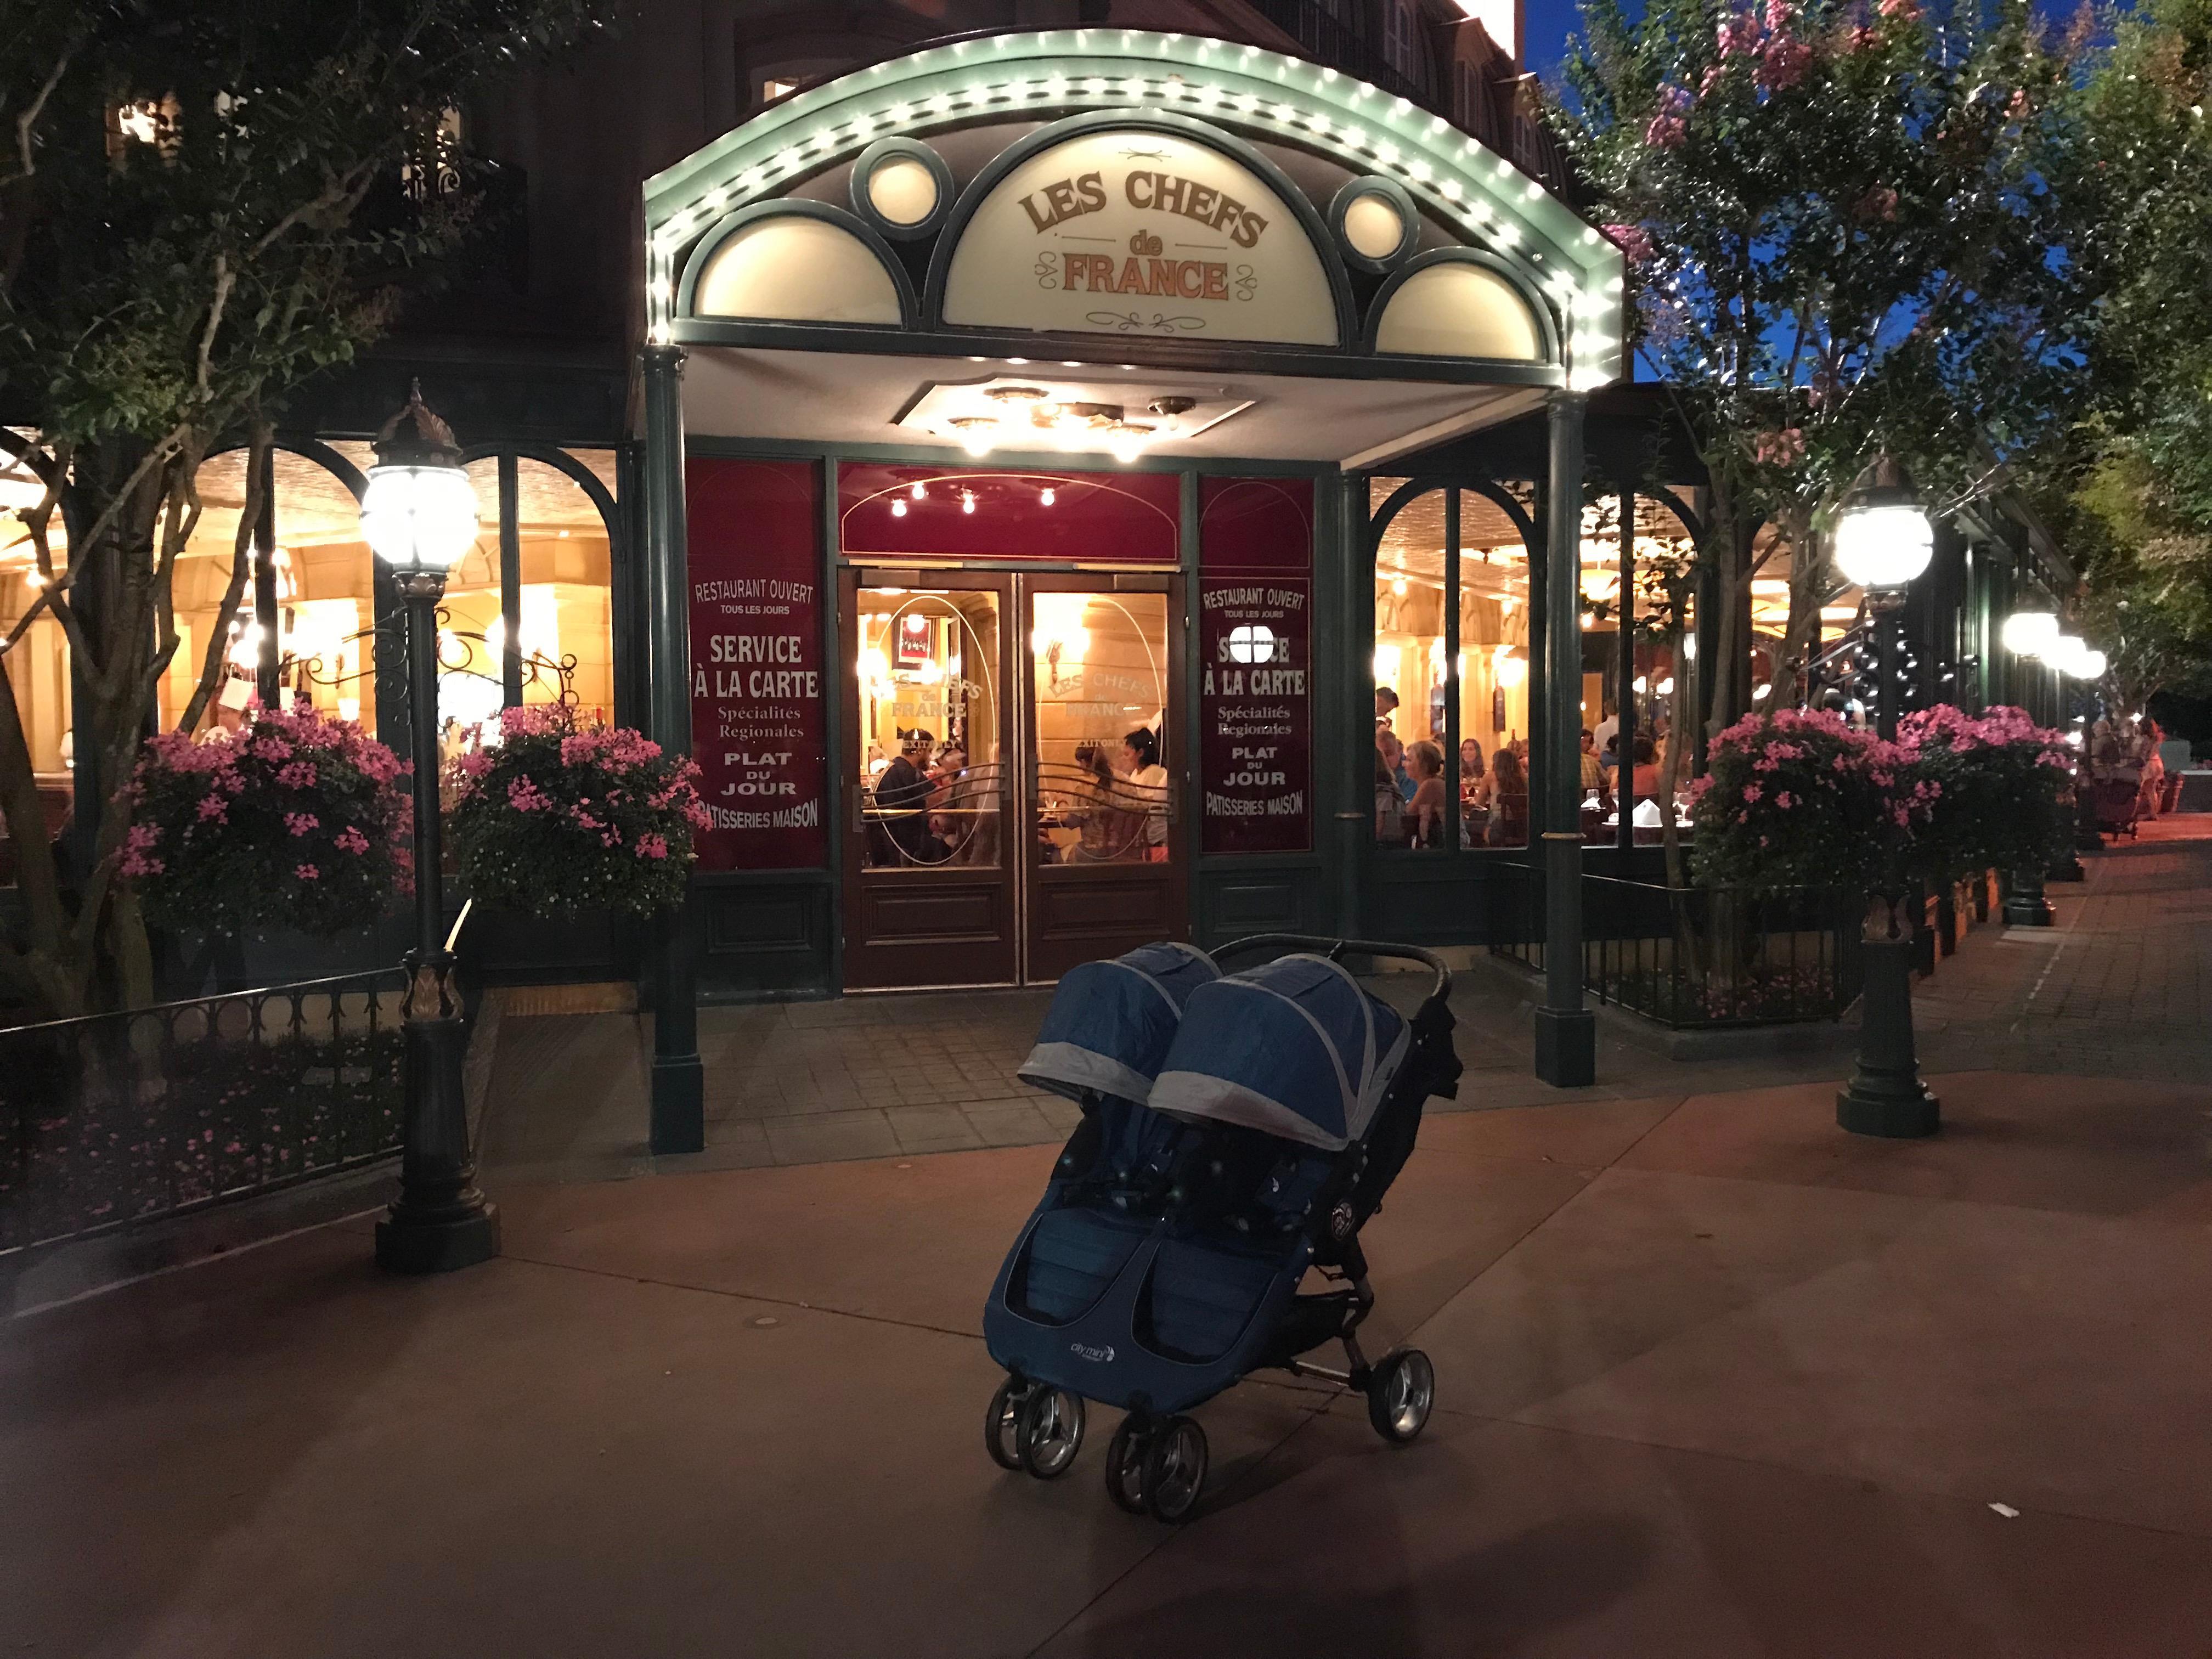 Stroller Rentals Disney image 41